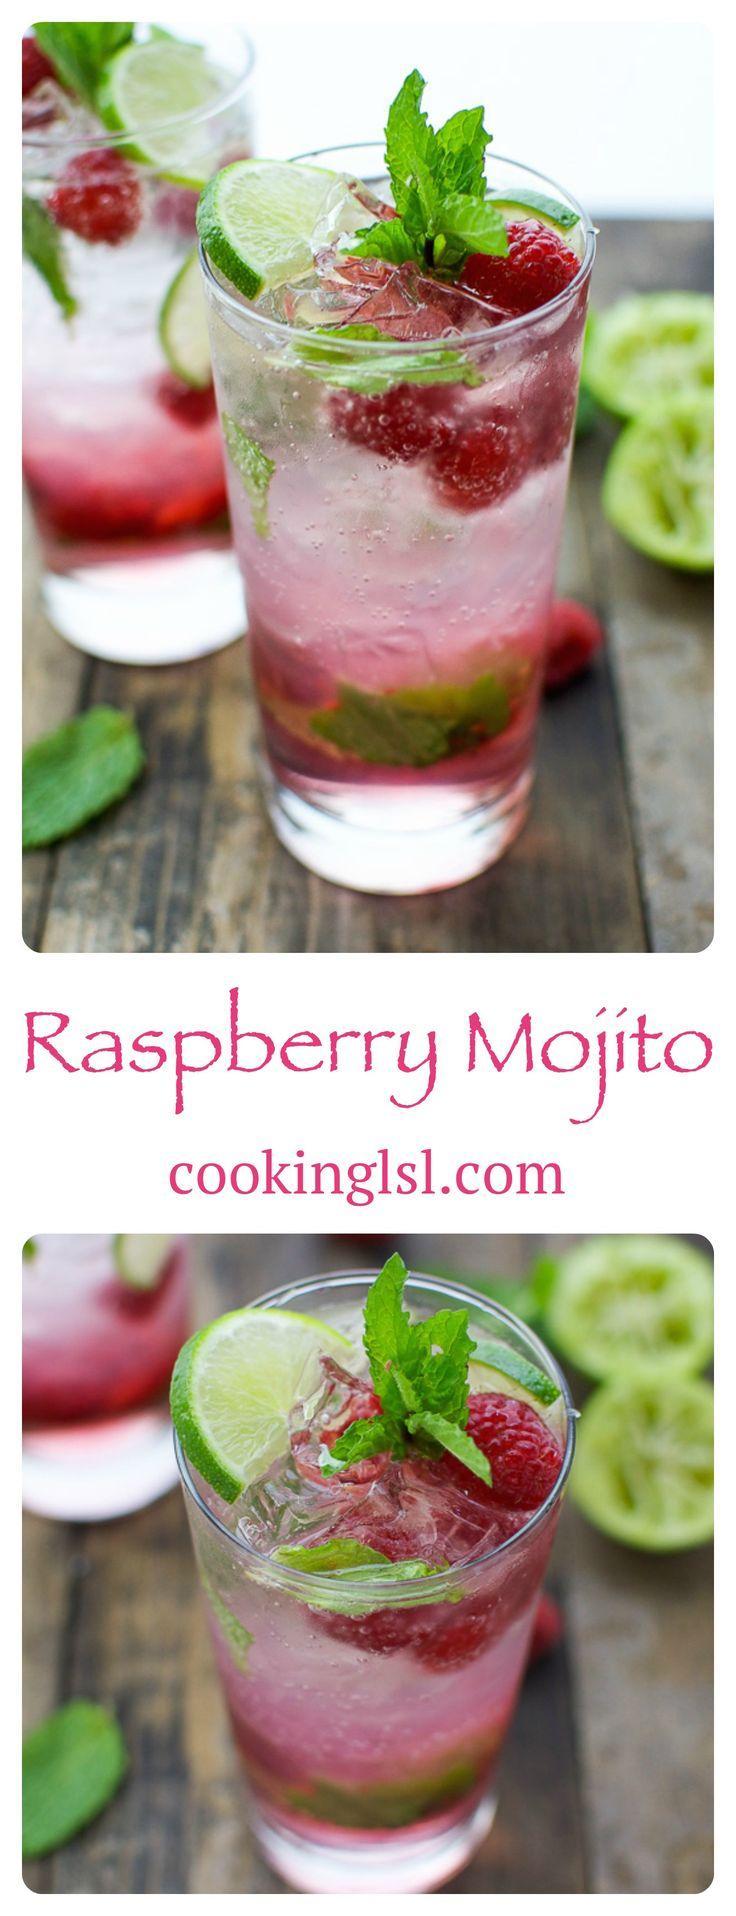 Hochzeit - Raspberry Mojito